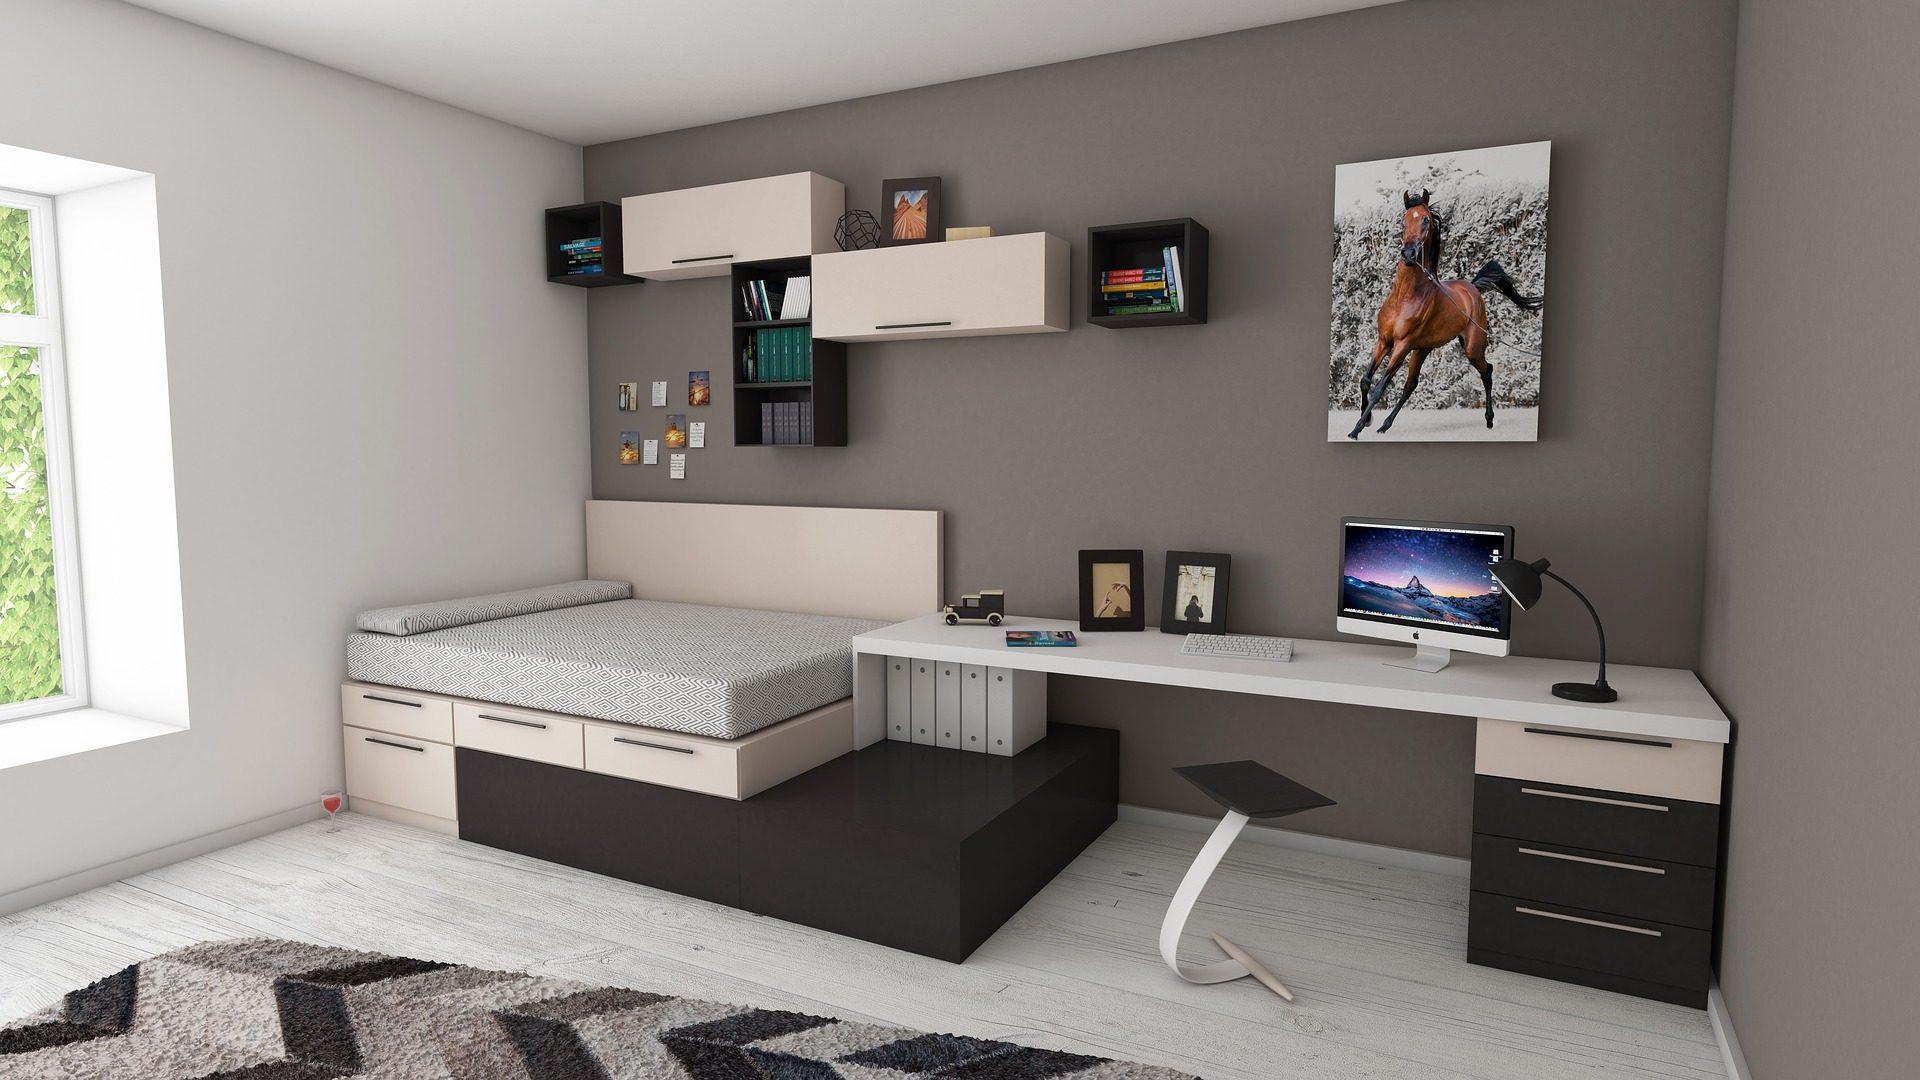 apartamento, कमरे, dormitorio, डेस्कटॉप, बिस्तर, कंप्यूटर - HD वॉलपेपर - प्रोफेसर-falken.com